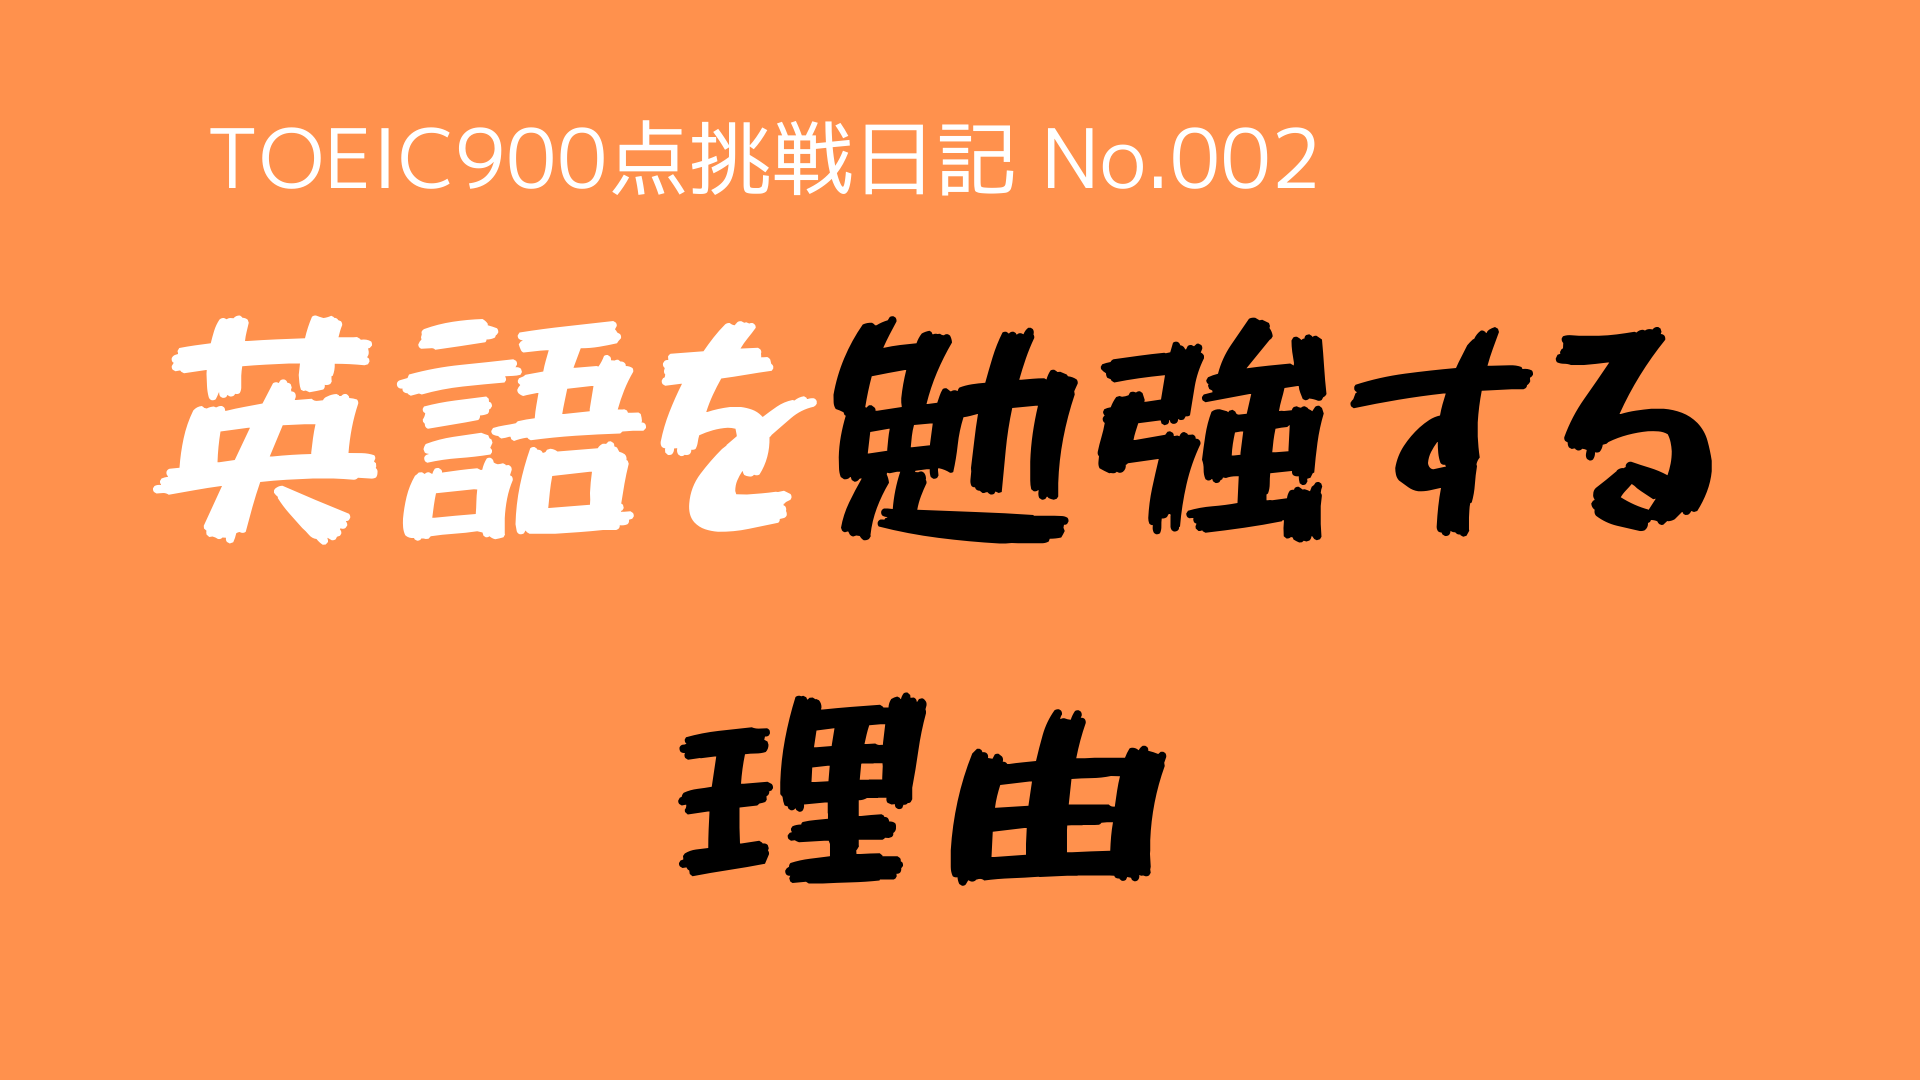 (TOEIC900点挑戦日記-No.002)なぜ、英語を勉強するのか?